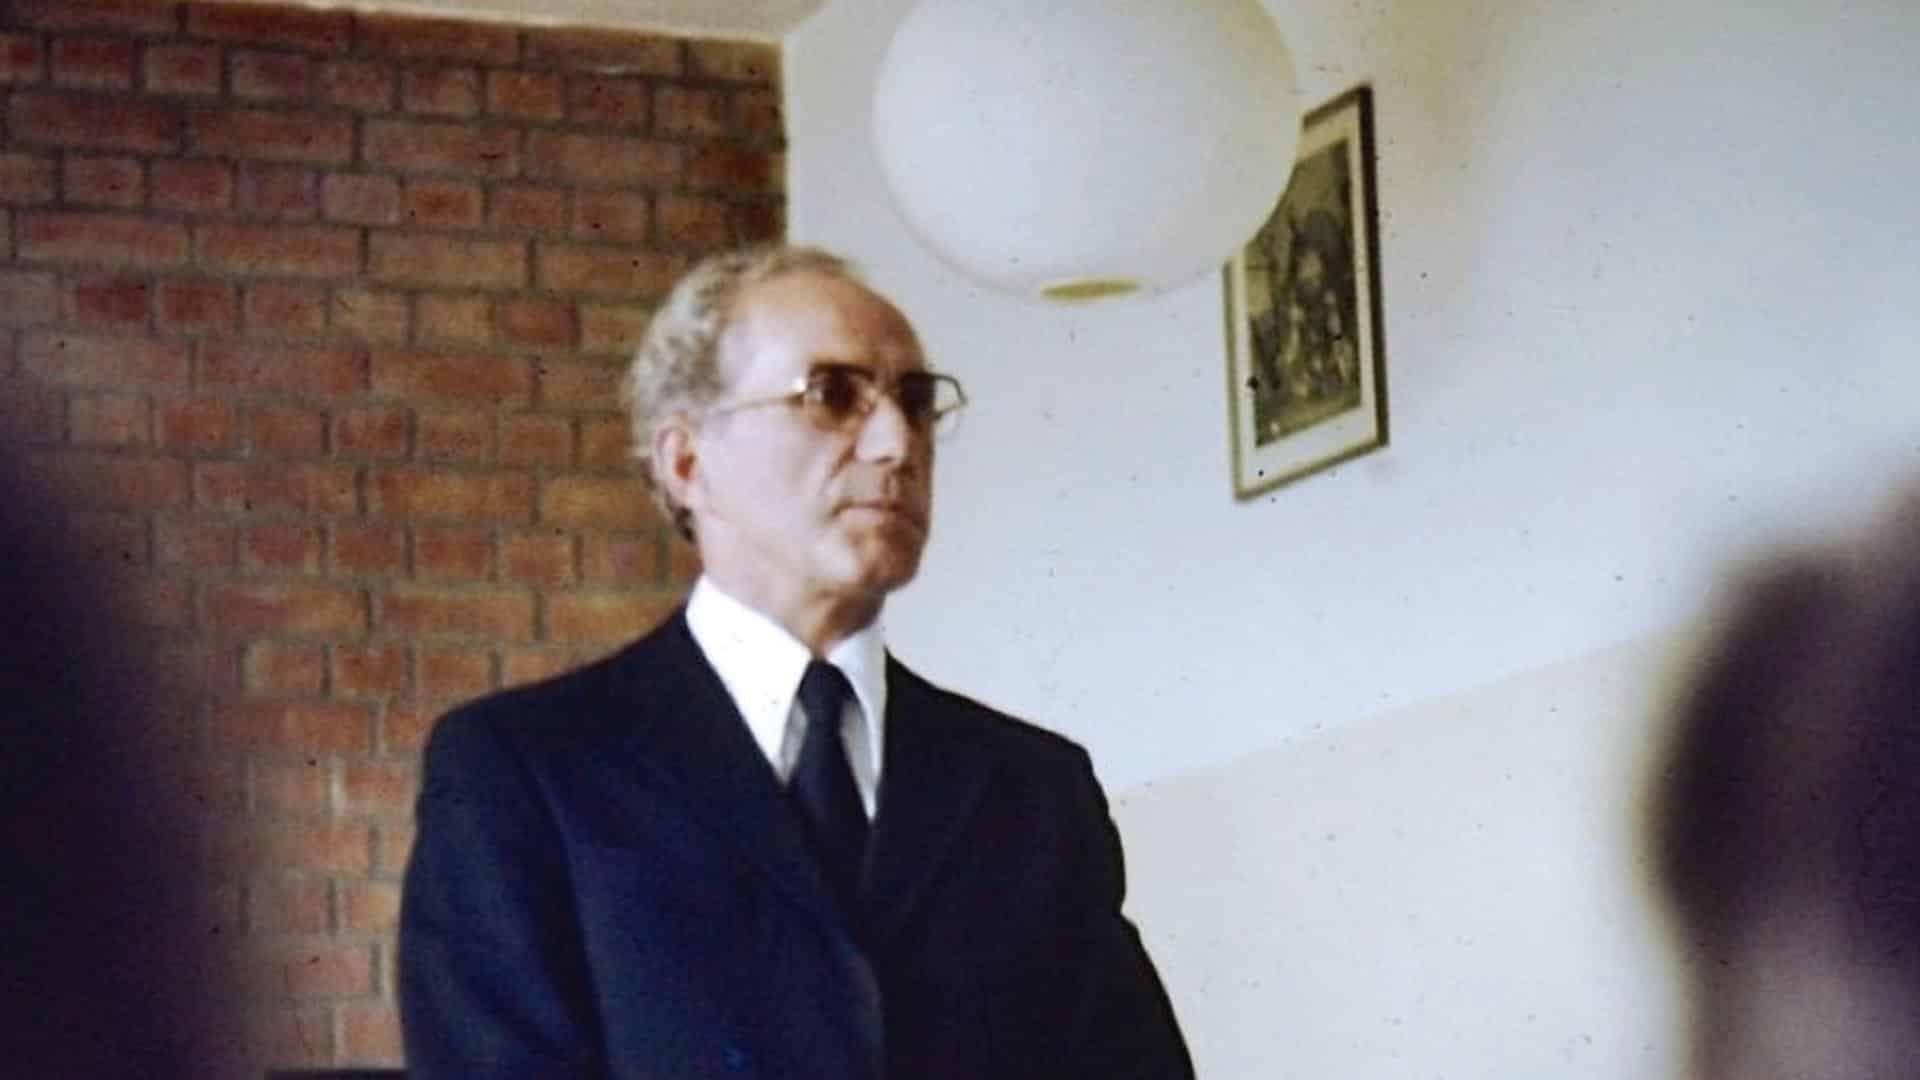 Johann Meier: Direktor an der Vorschule in Ettertzhausen: ein Gewaltäter. Foto: SWR/ Mona Botros